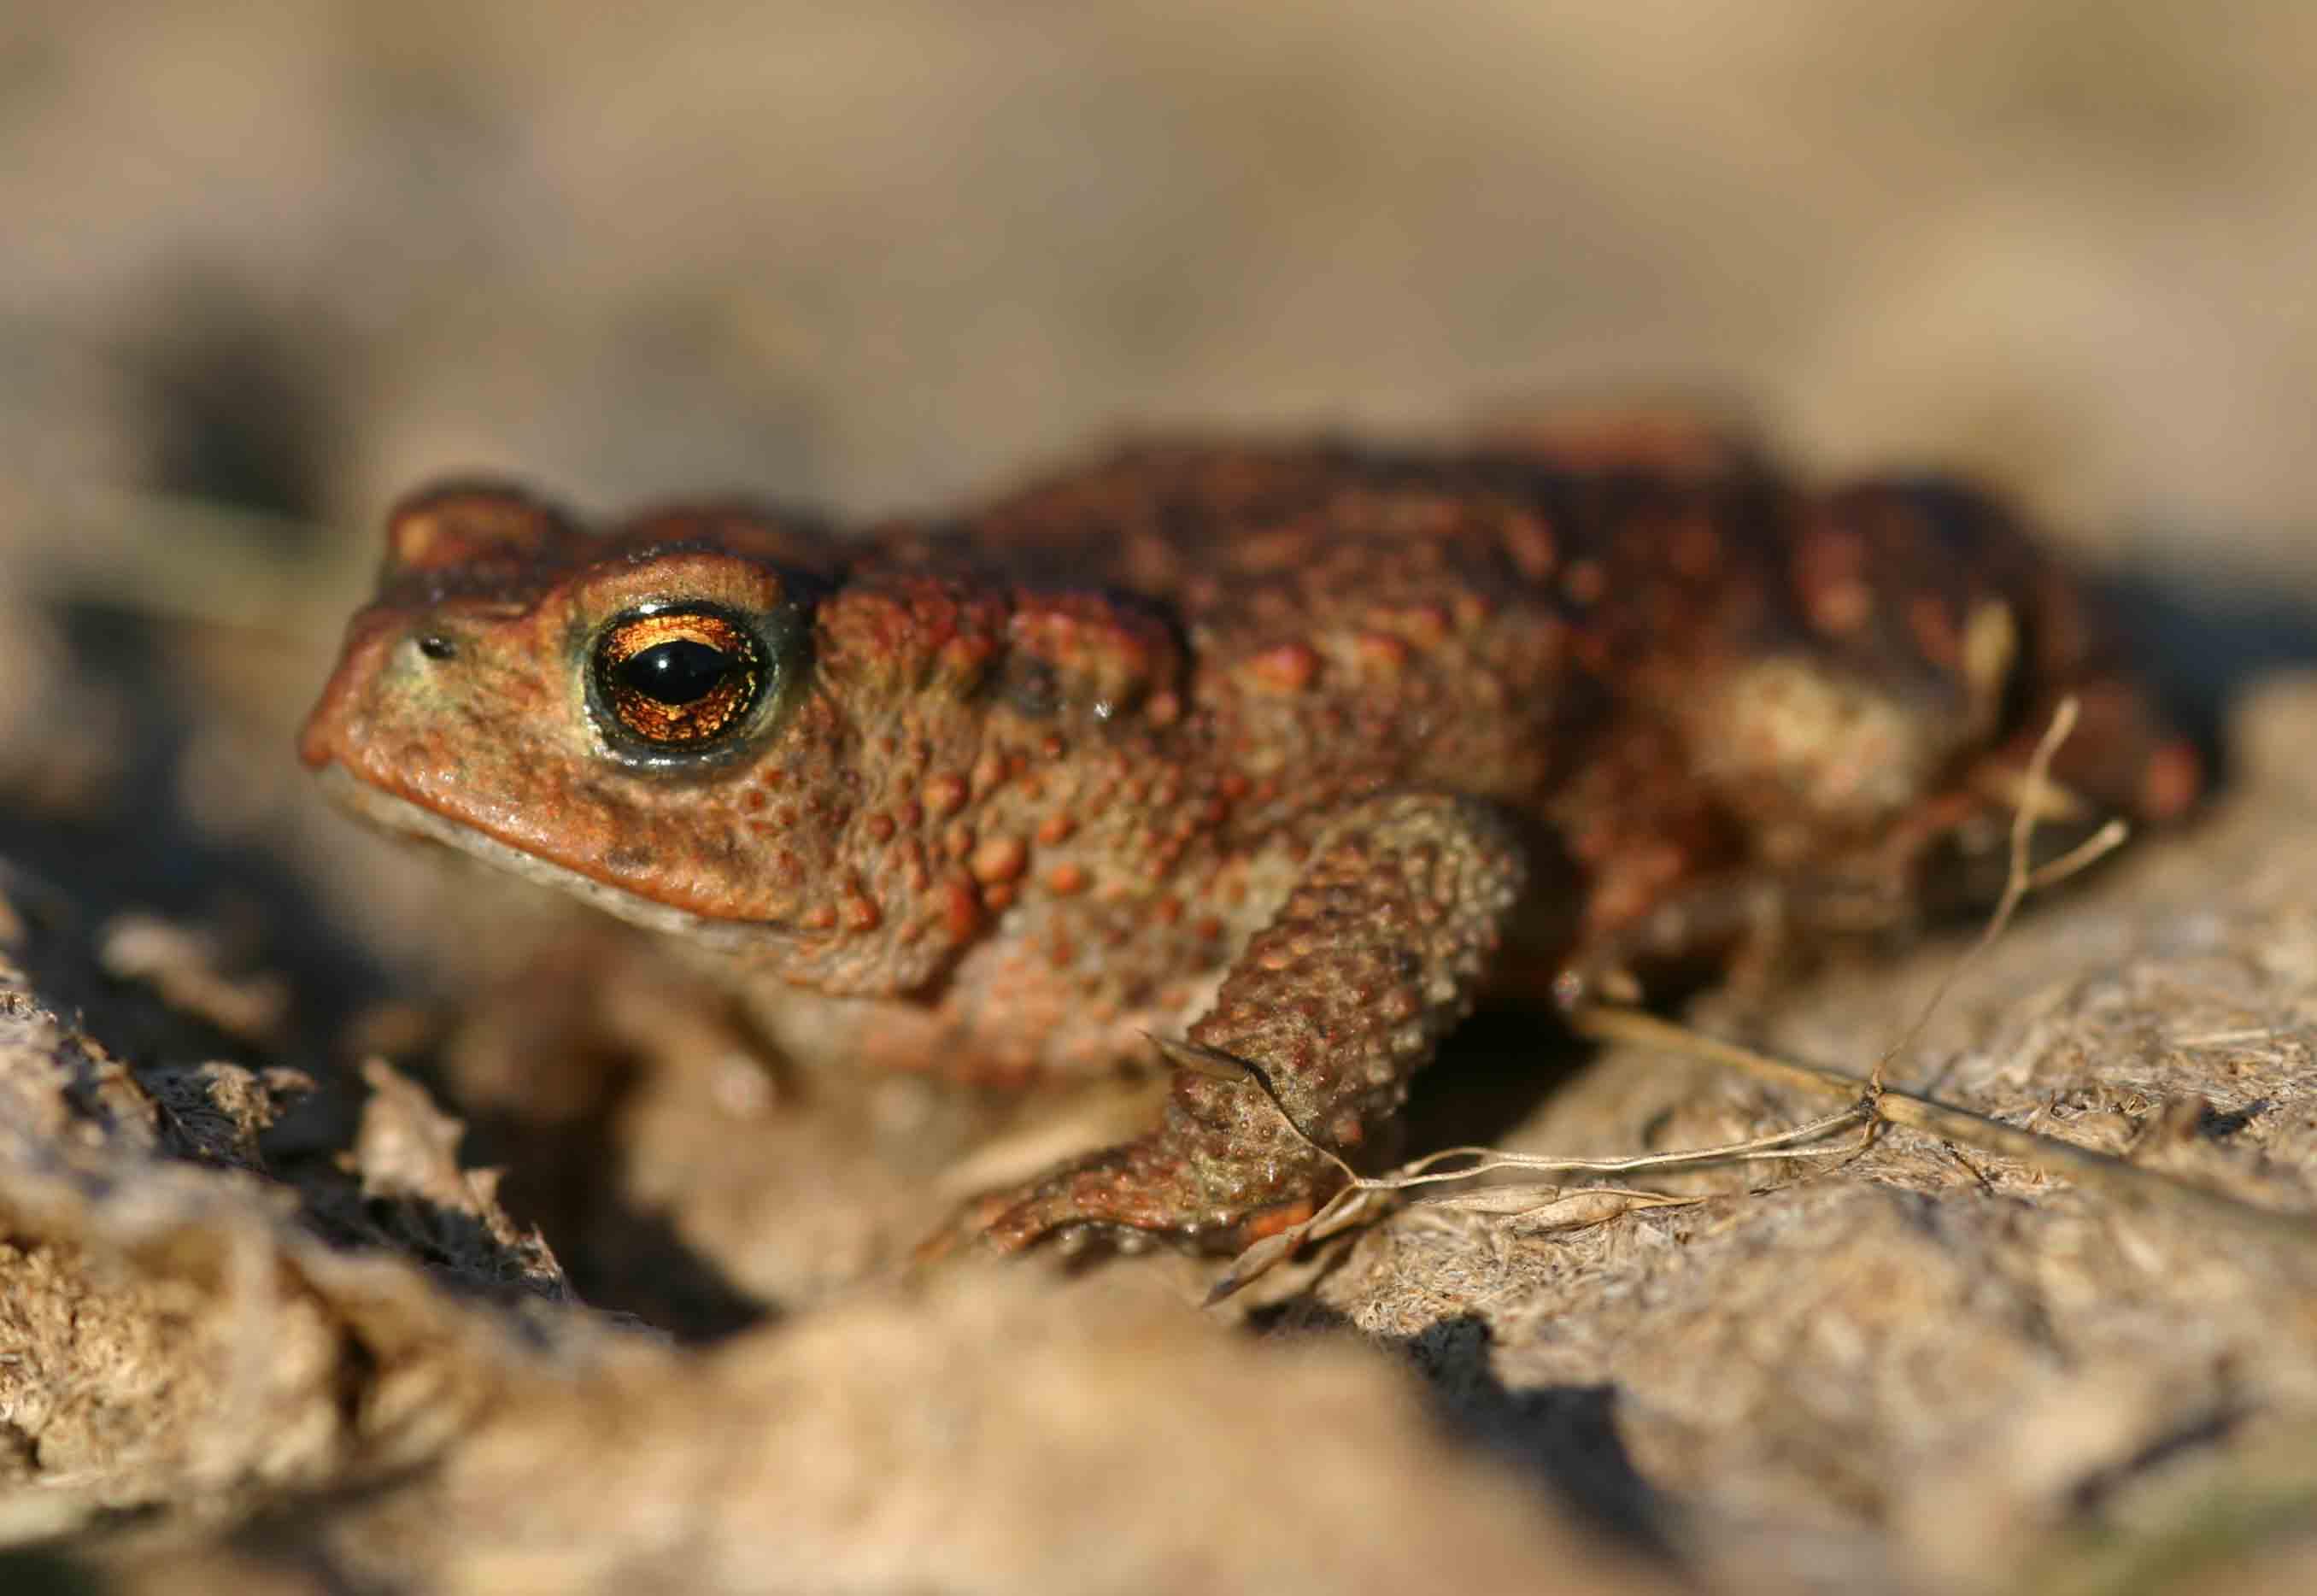 Common toad (Bufo bufo)